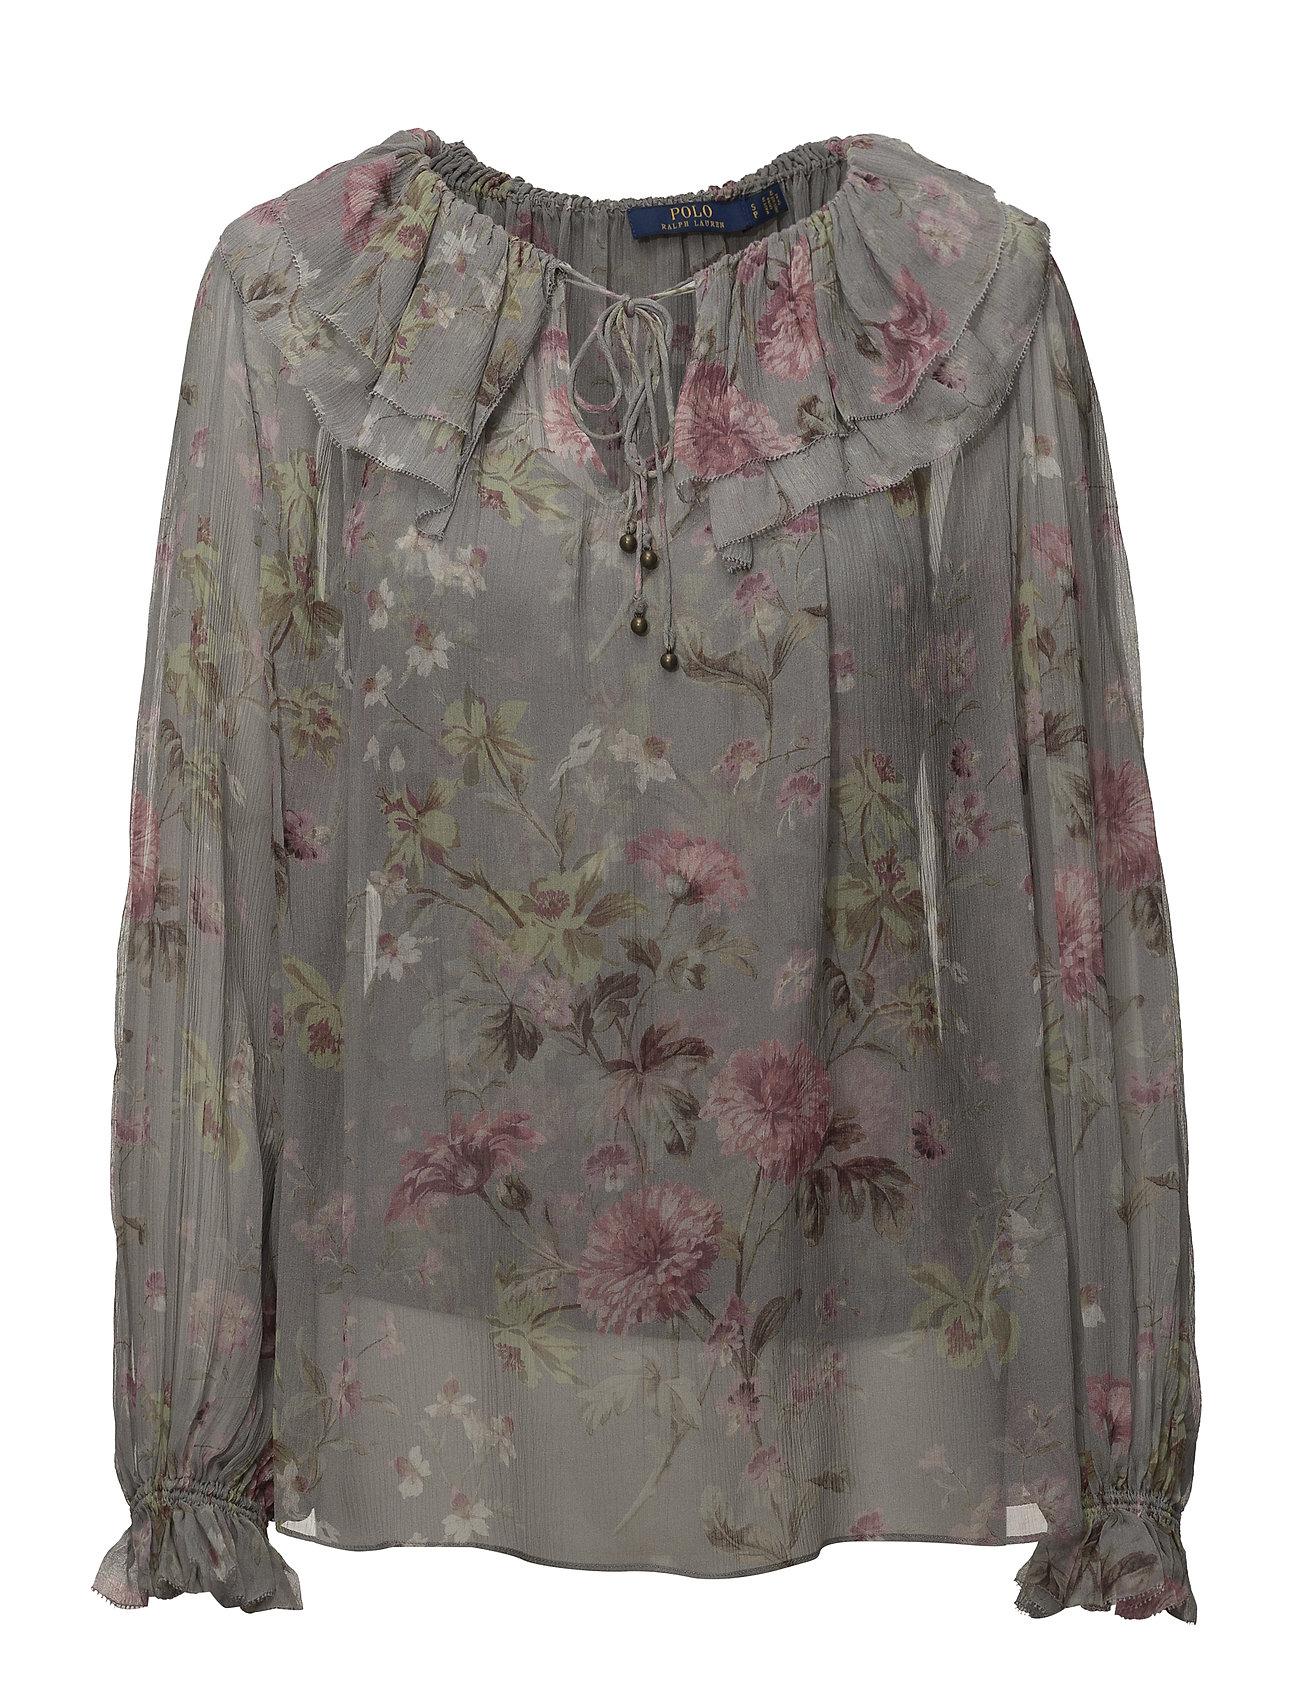 Polo Ralph Lauren Sheer Silk Floral Blouse - ELTON FLORAL